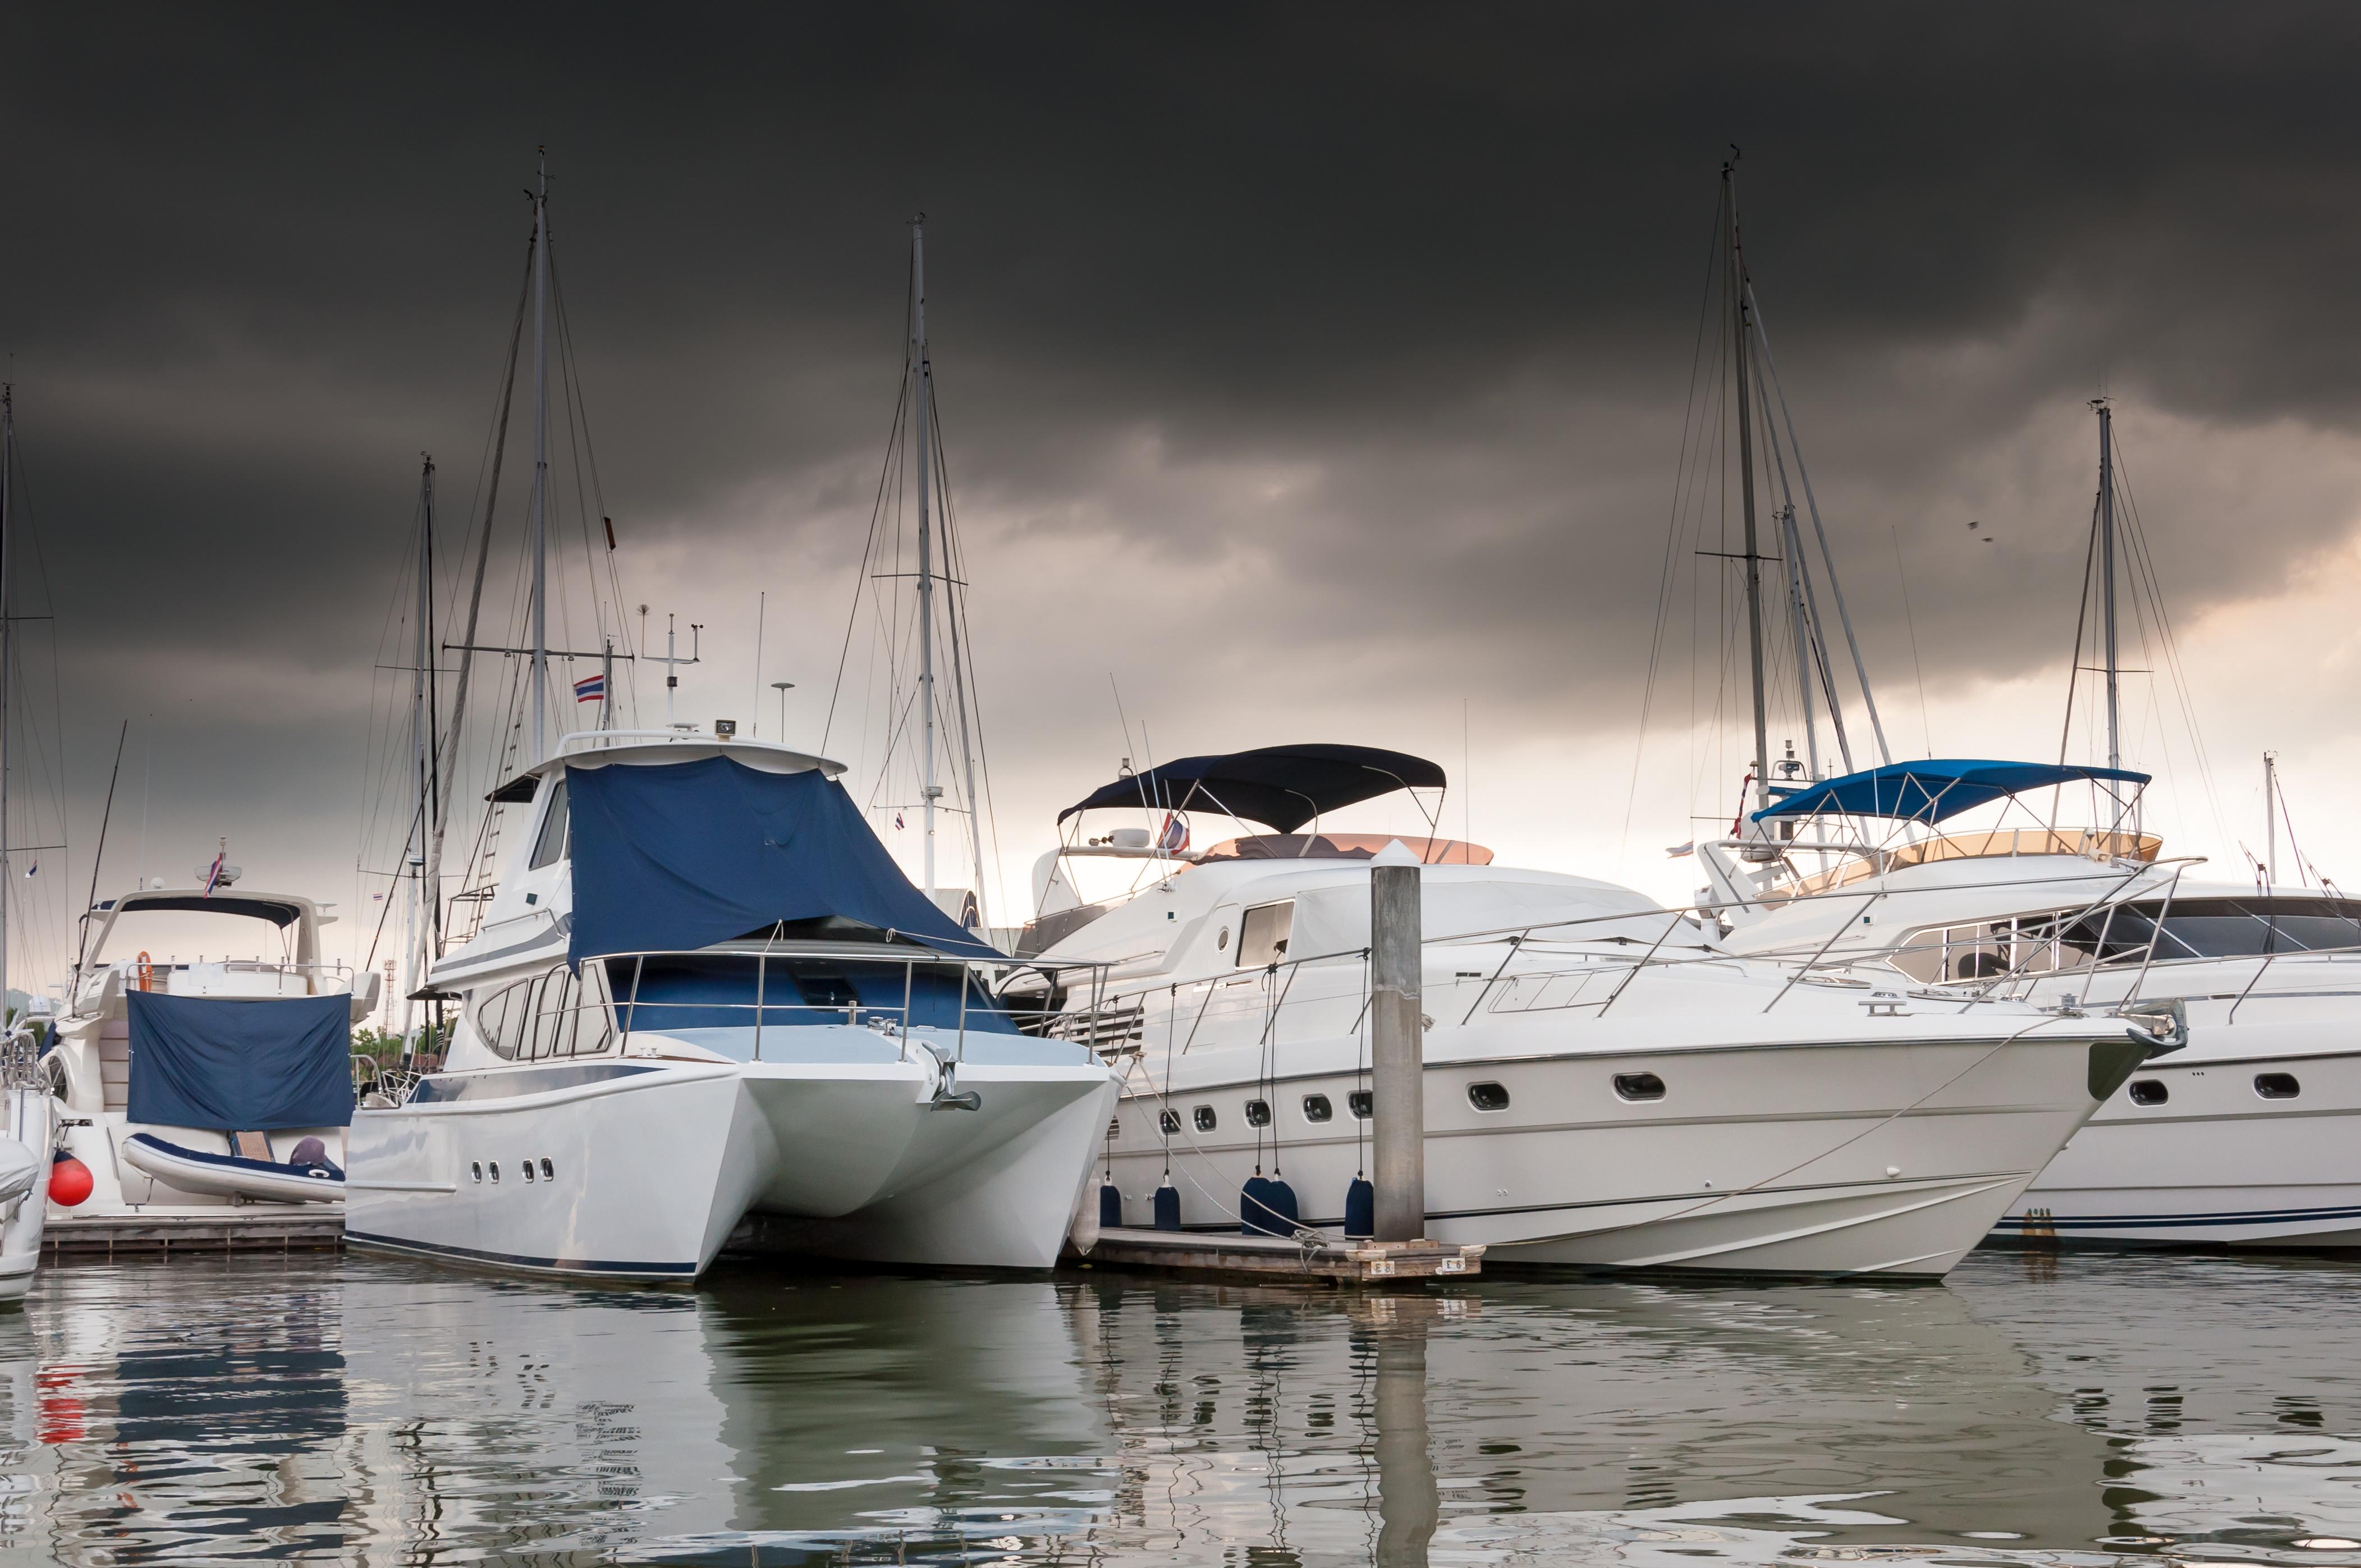 marine hurricane safety